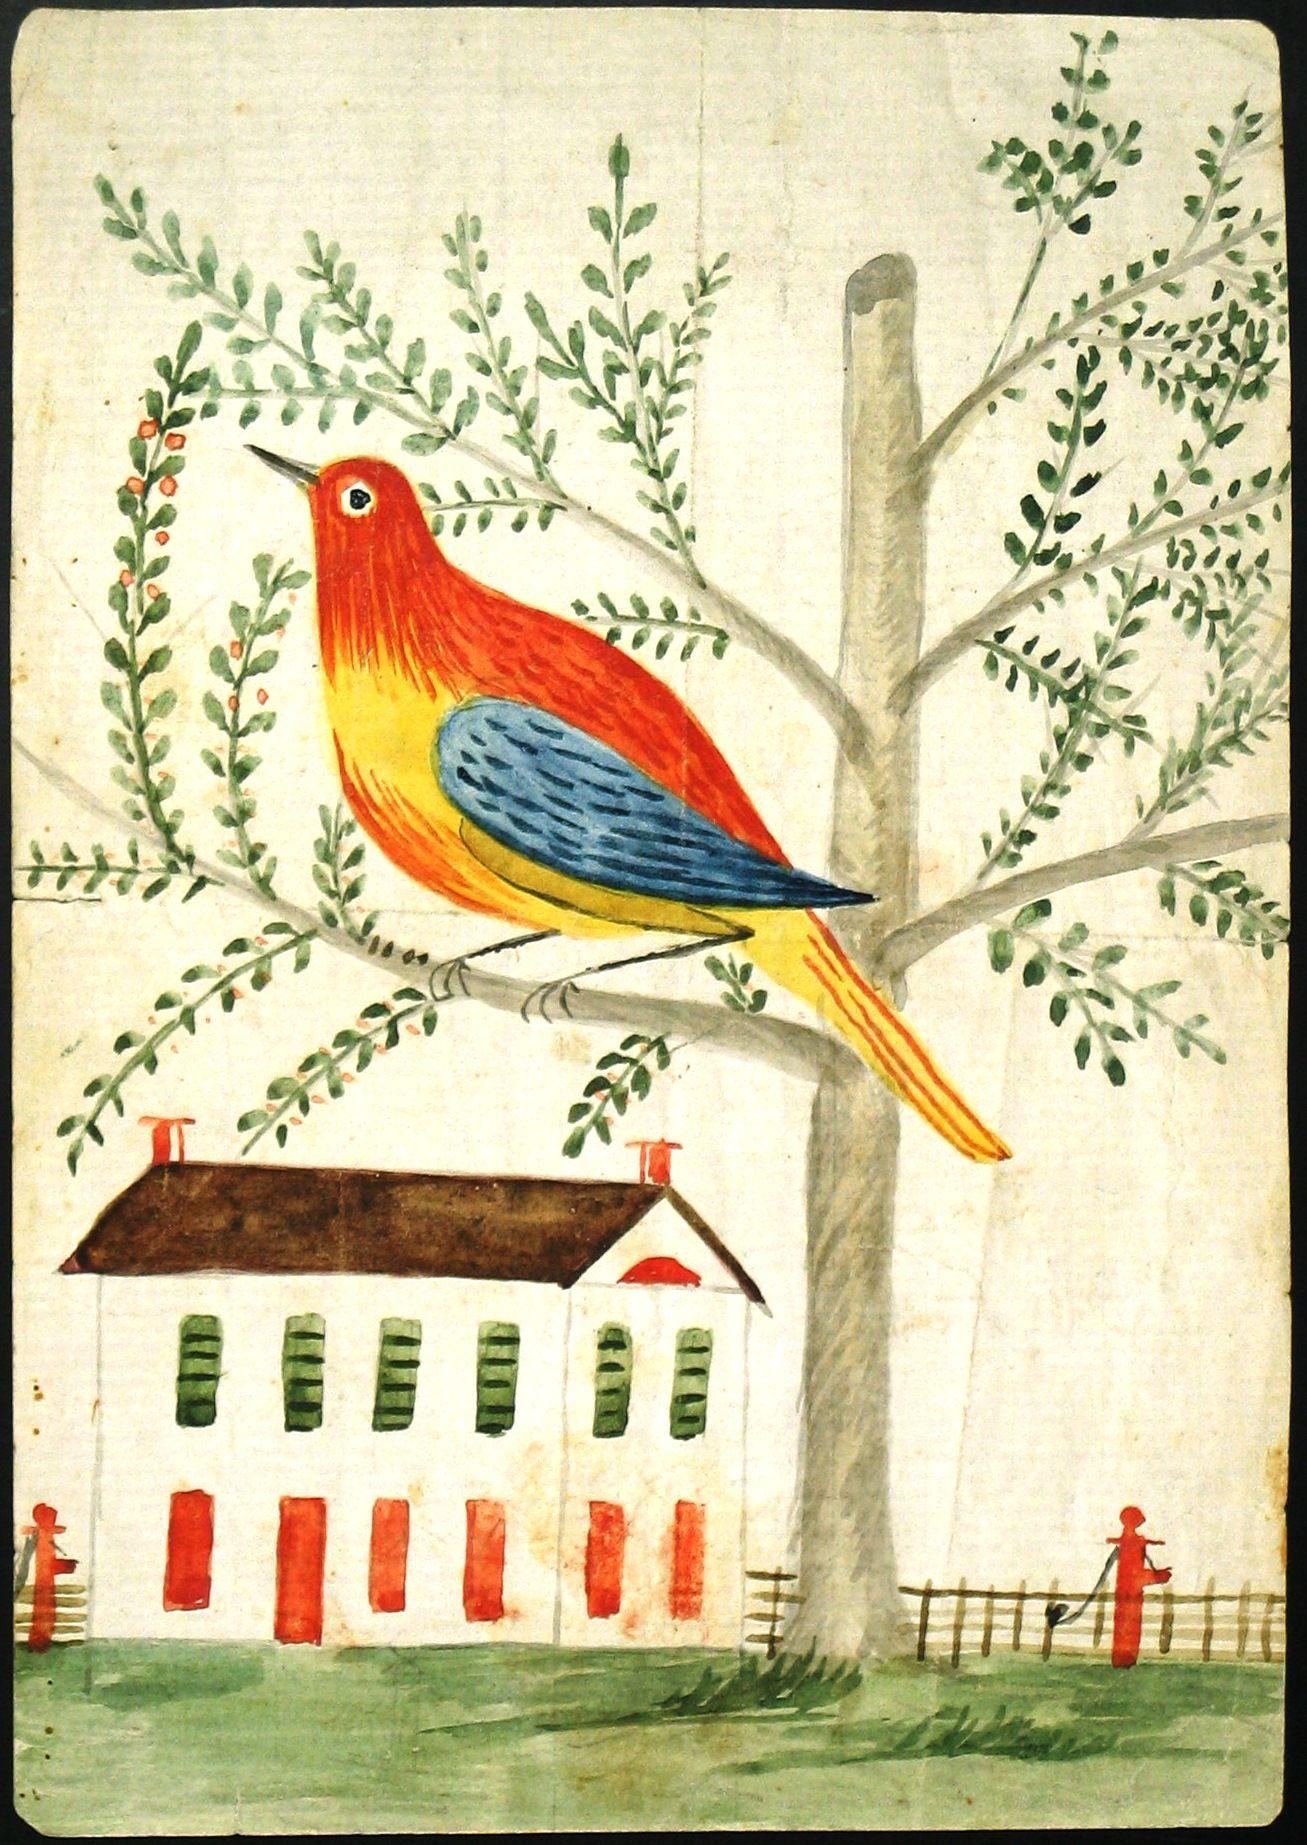 German House Designs: Beautiful Pennsylvania Dutch Illustration Of A Bird In A